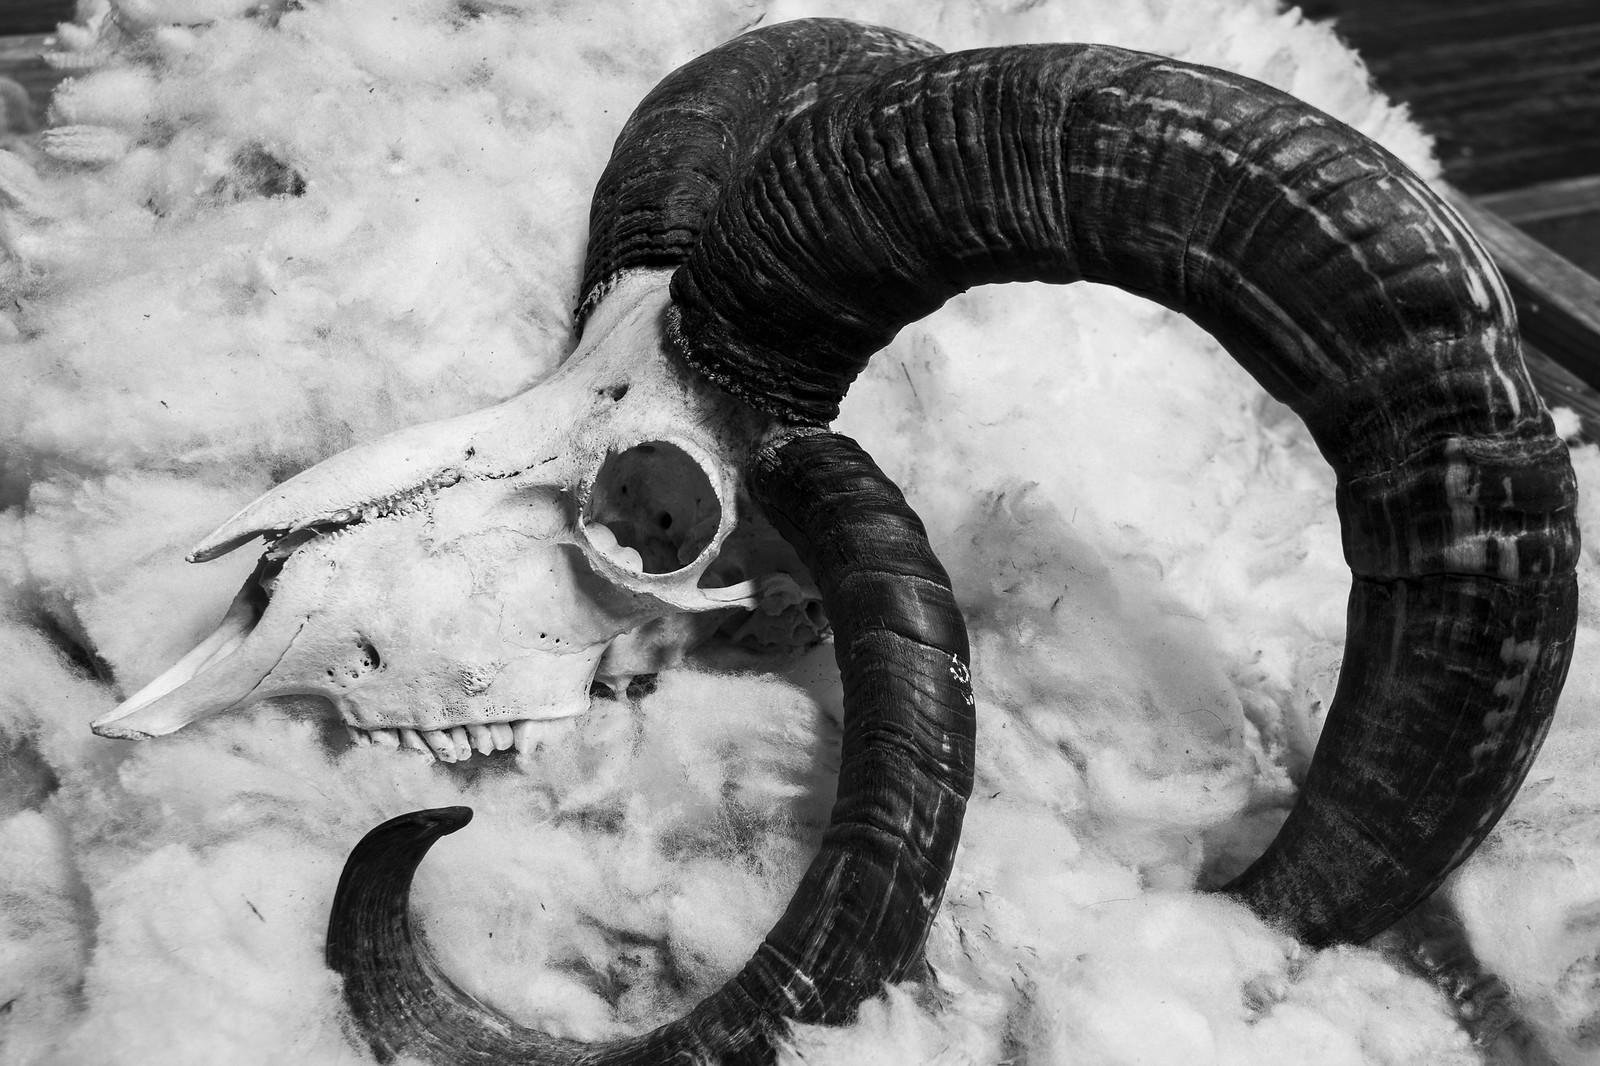 Jacob Ram skull